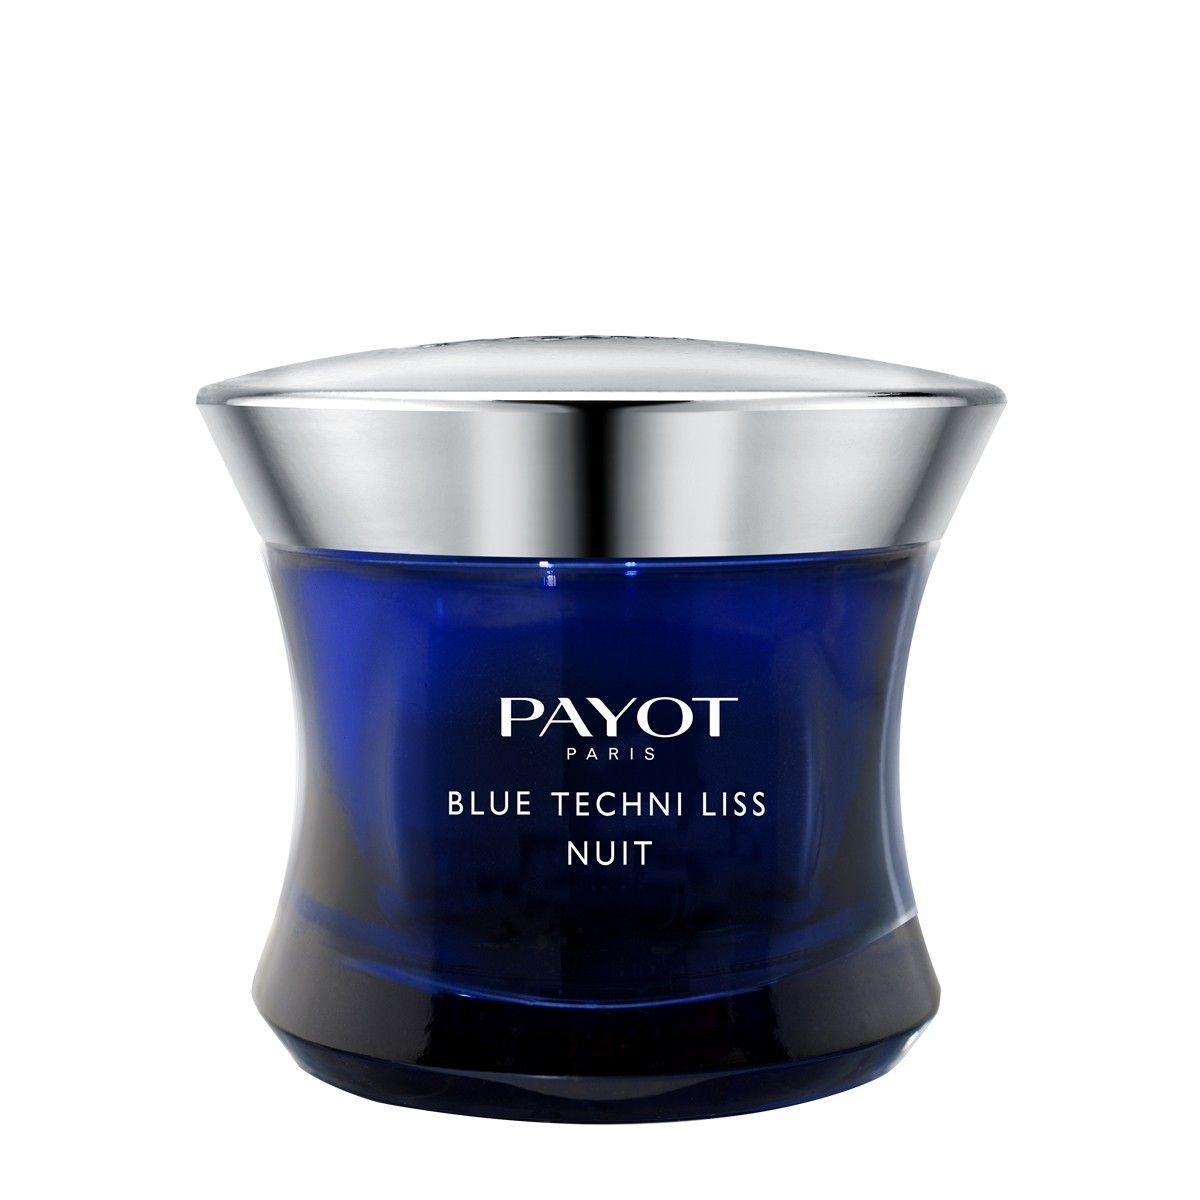 Afbeelding van Payot Blue Techni Liss Renovateur Nuit